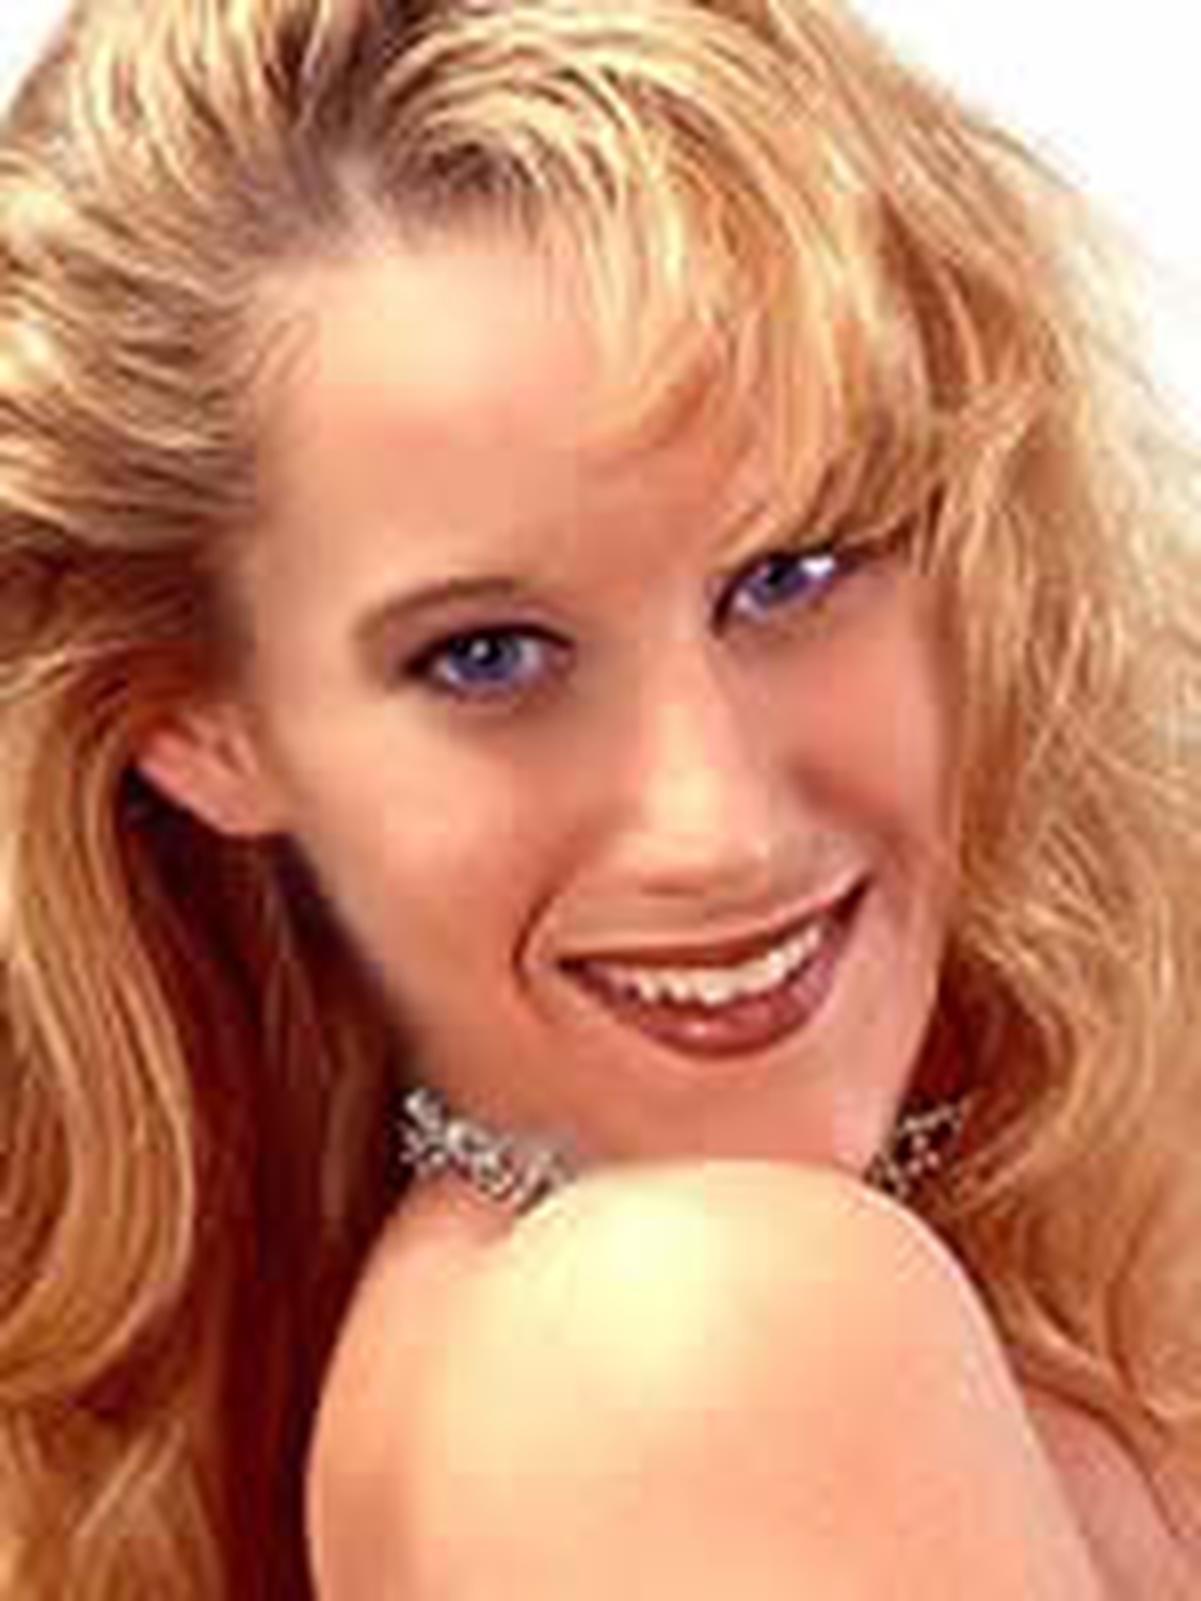 Tabatha Jordan Wiki & Bio - Pornographic Actress